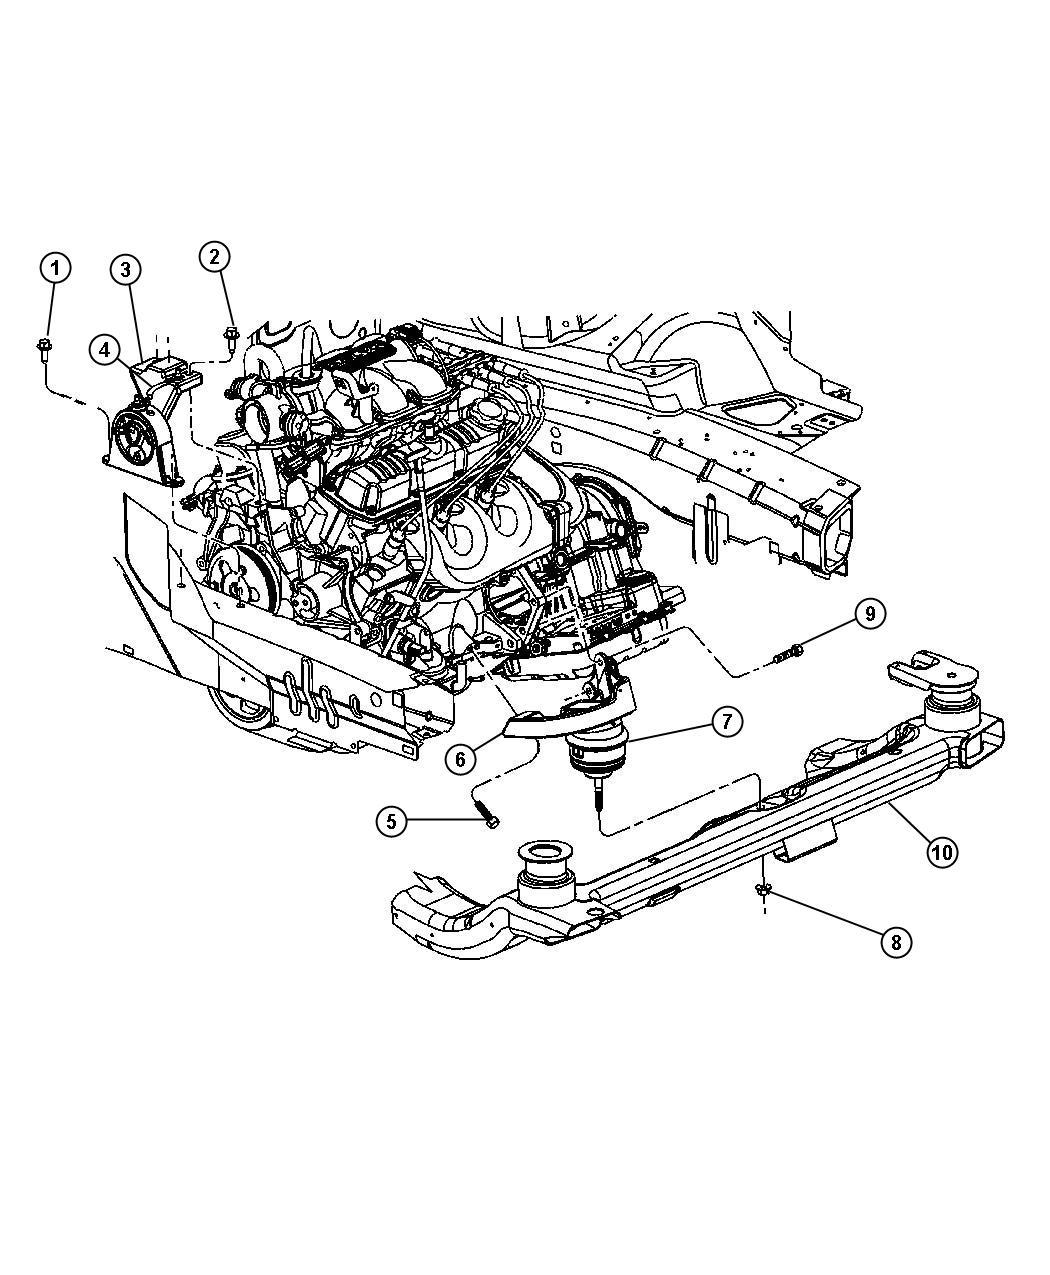 2008 Chrysler Pacifica Isolator. Rear. Engine mount. Rear